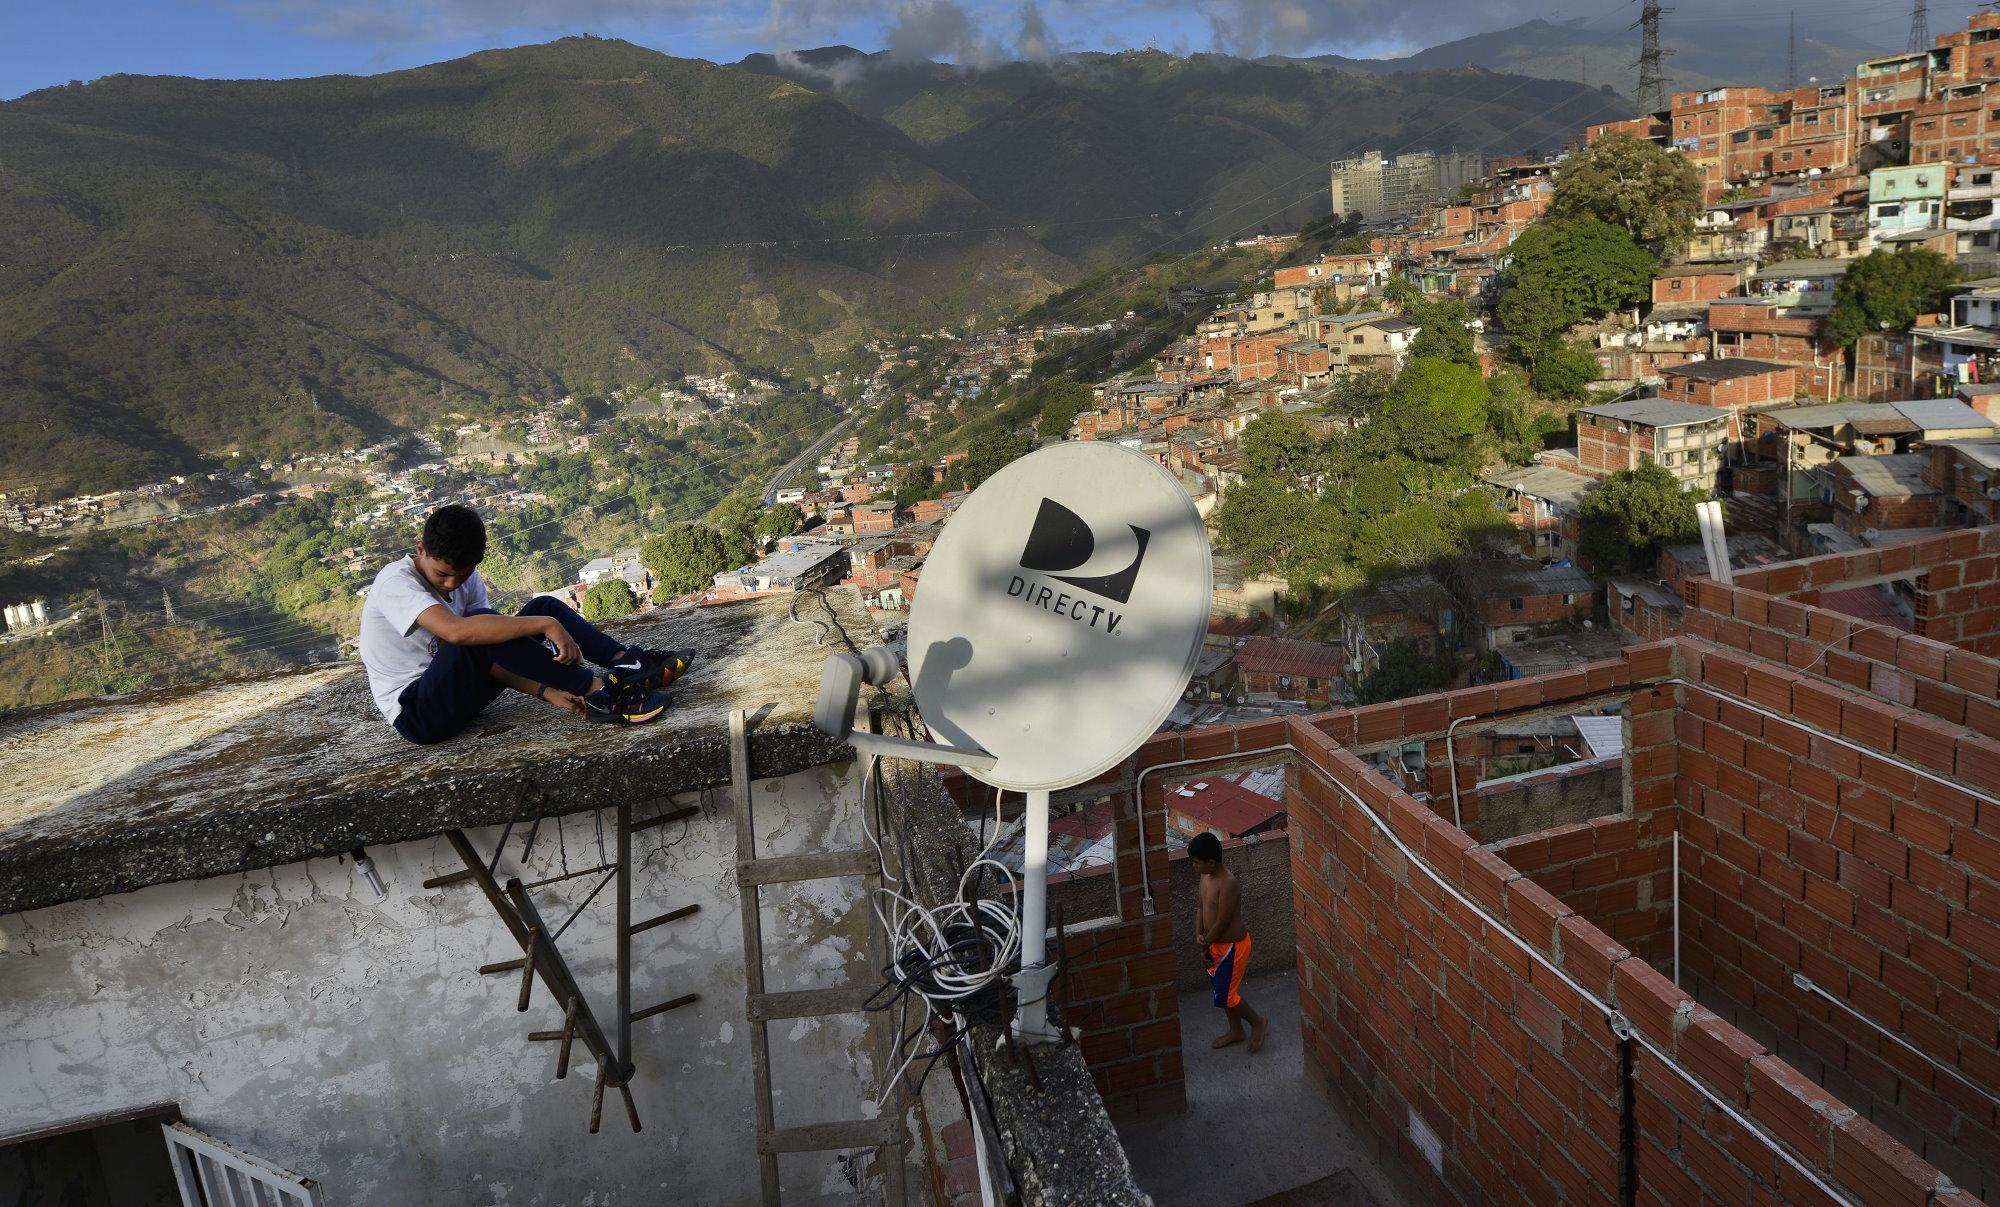 DirecTV Latin America Venezuela